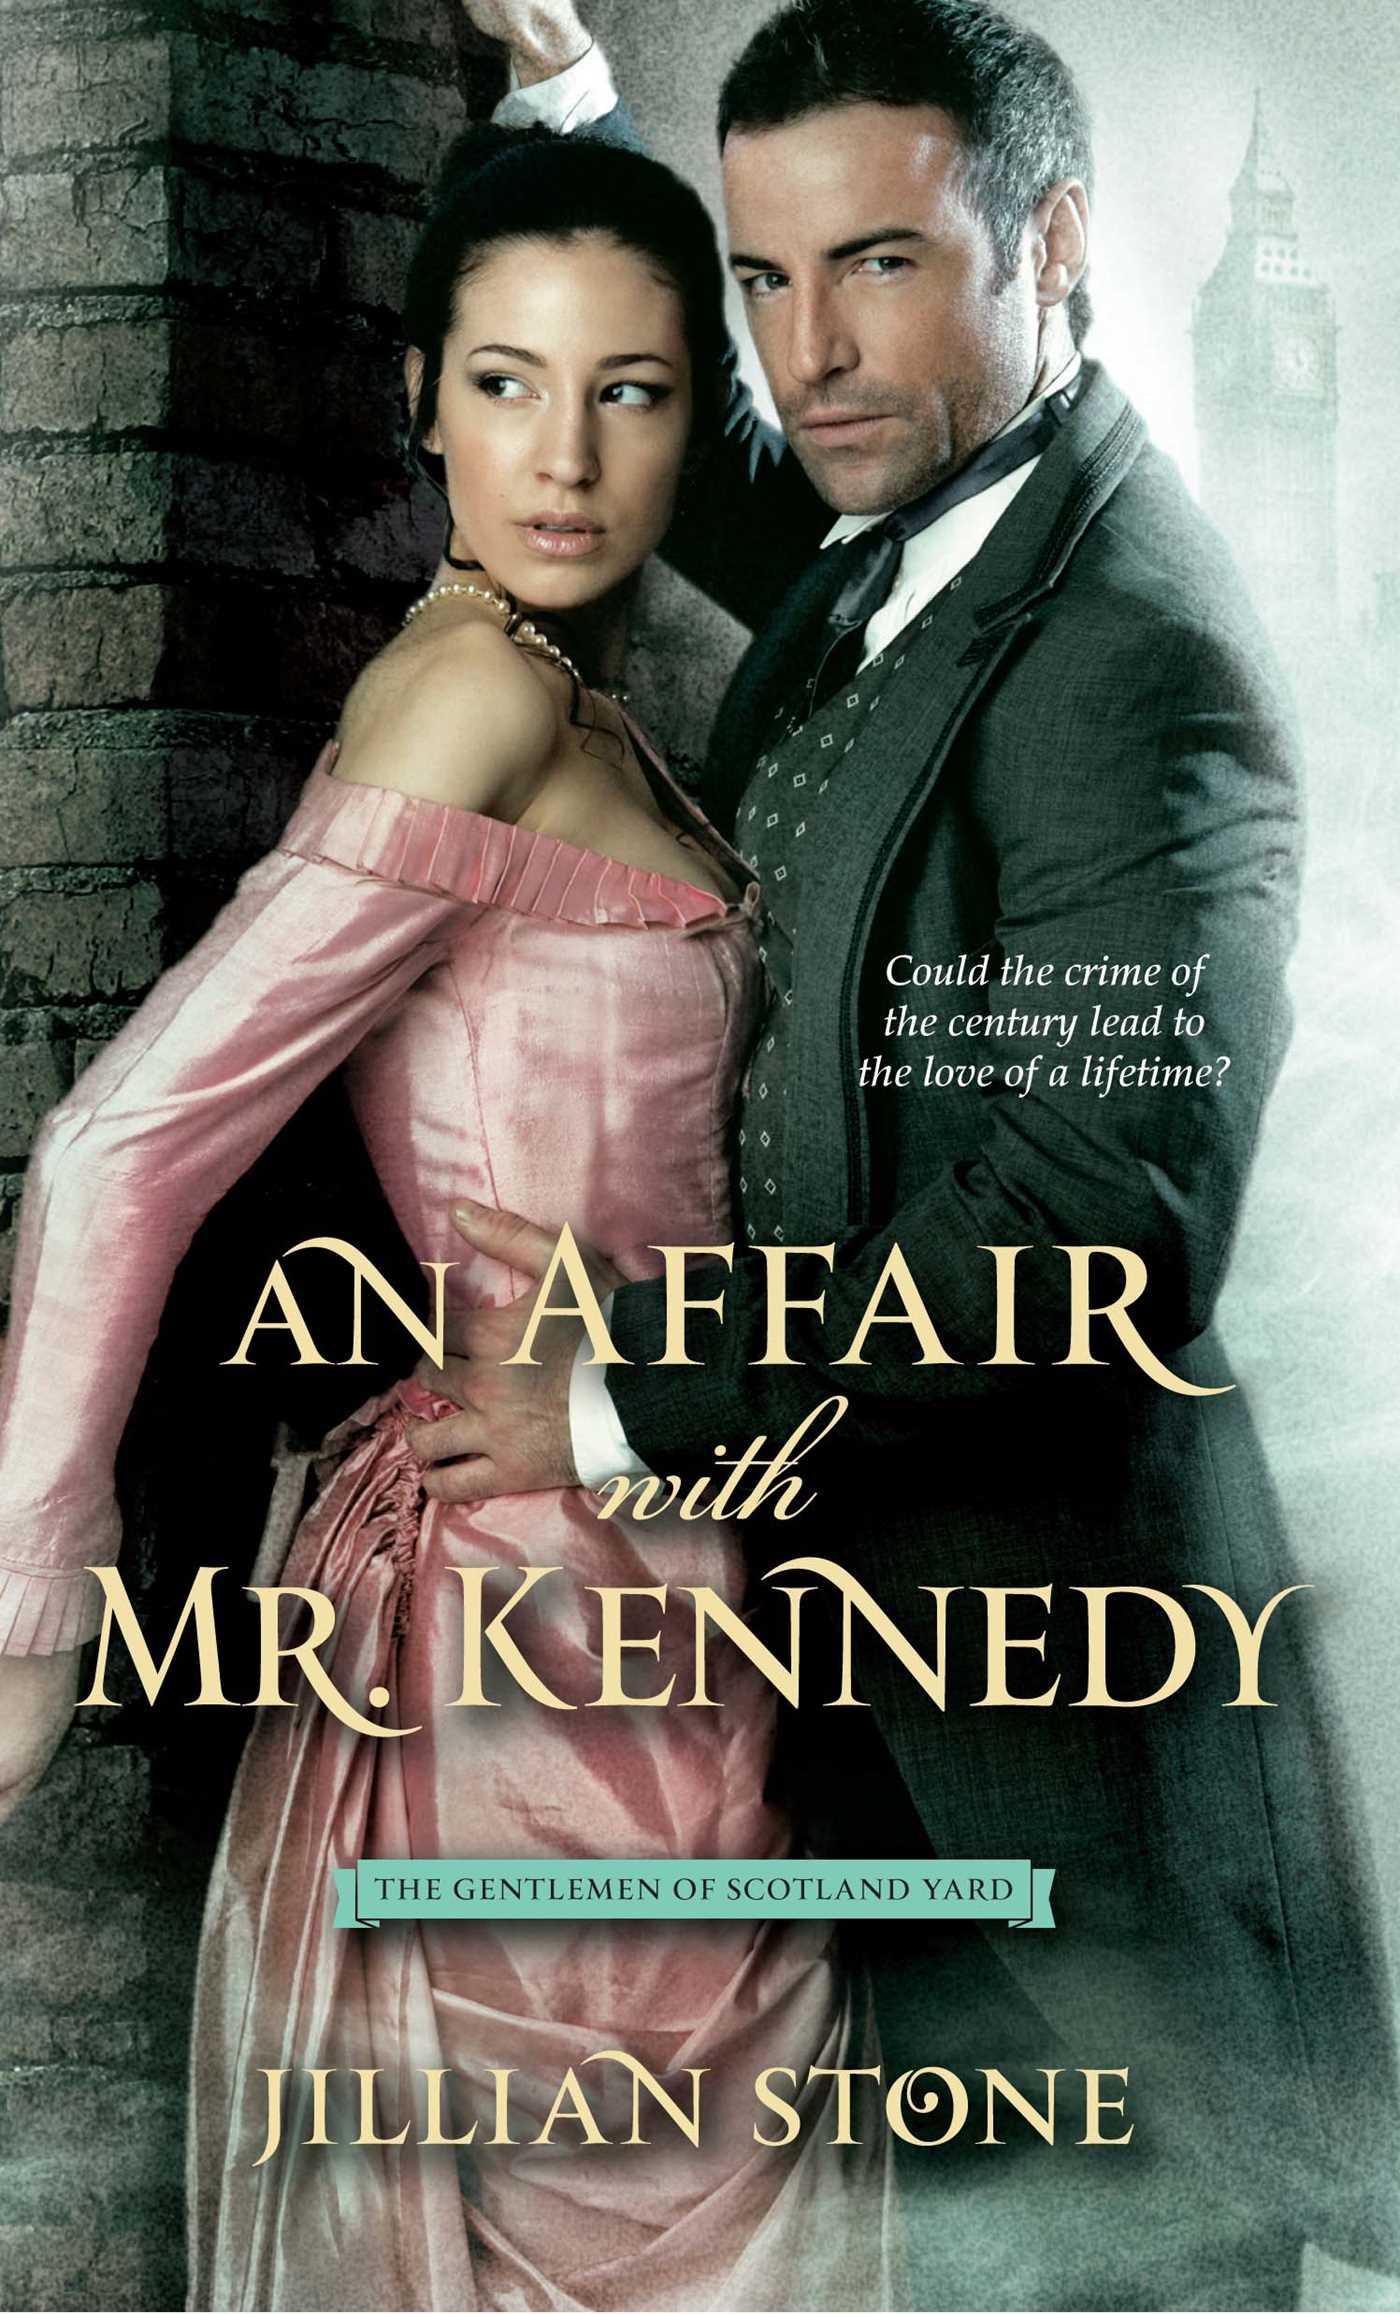 An affair with mr kennedy 9781451629071 hr